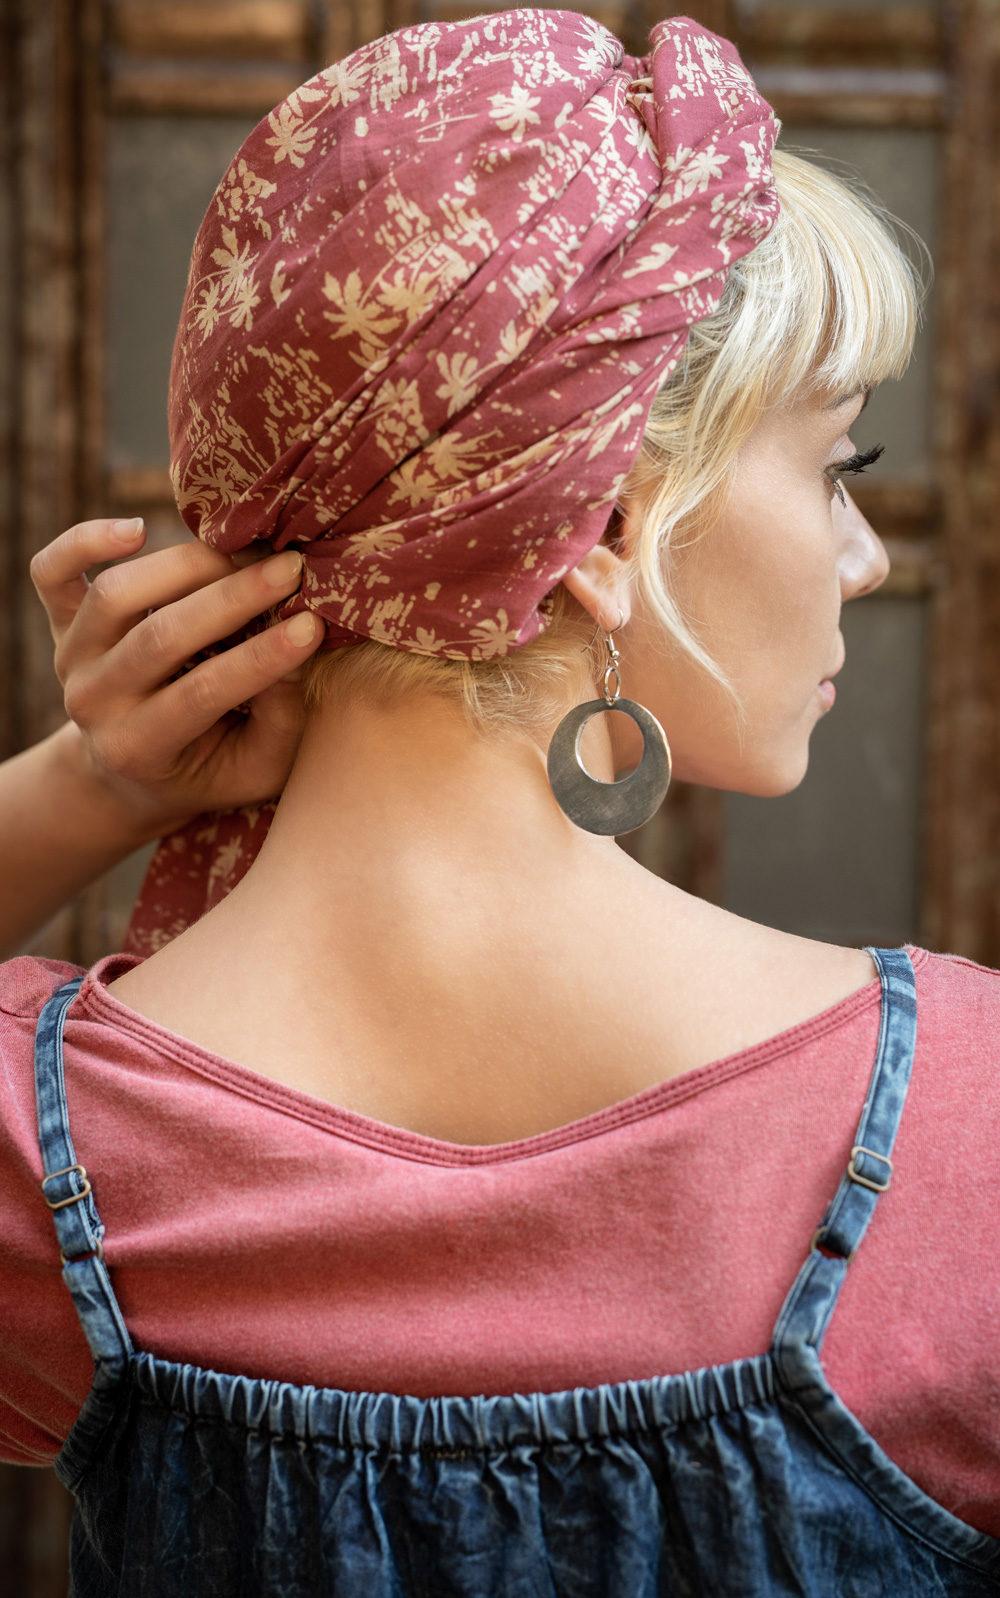 earrings-alluminio-05-19